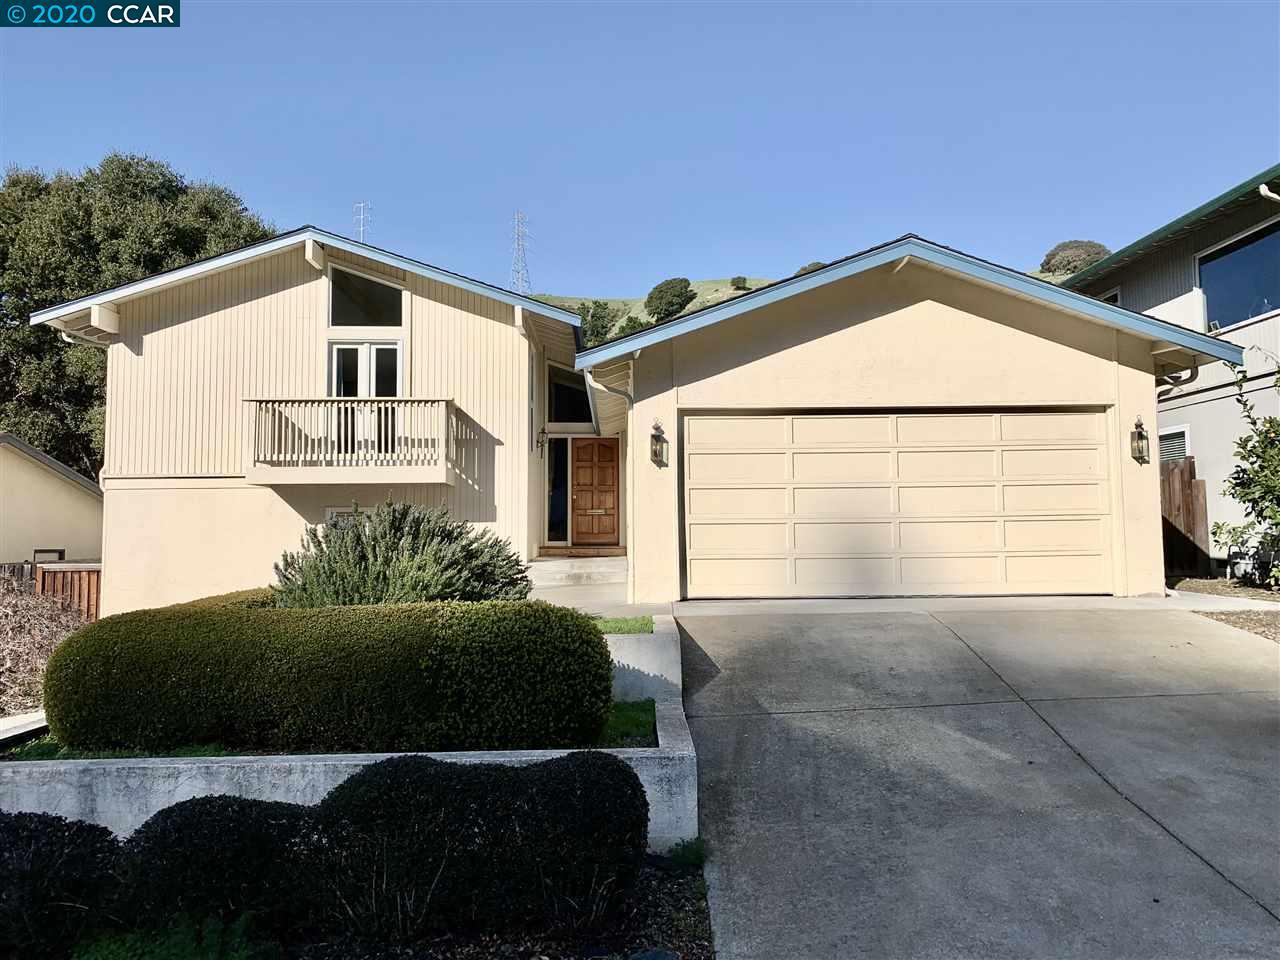 2871 Wright Ave Pinole, CA 94564